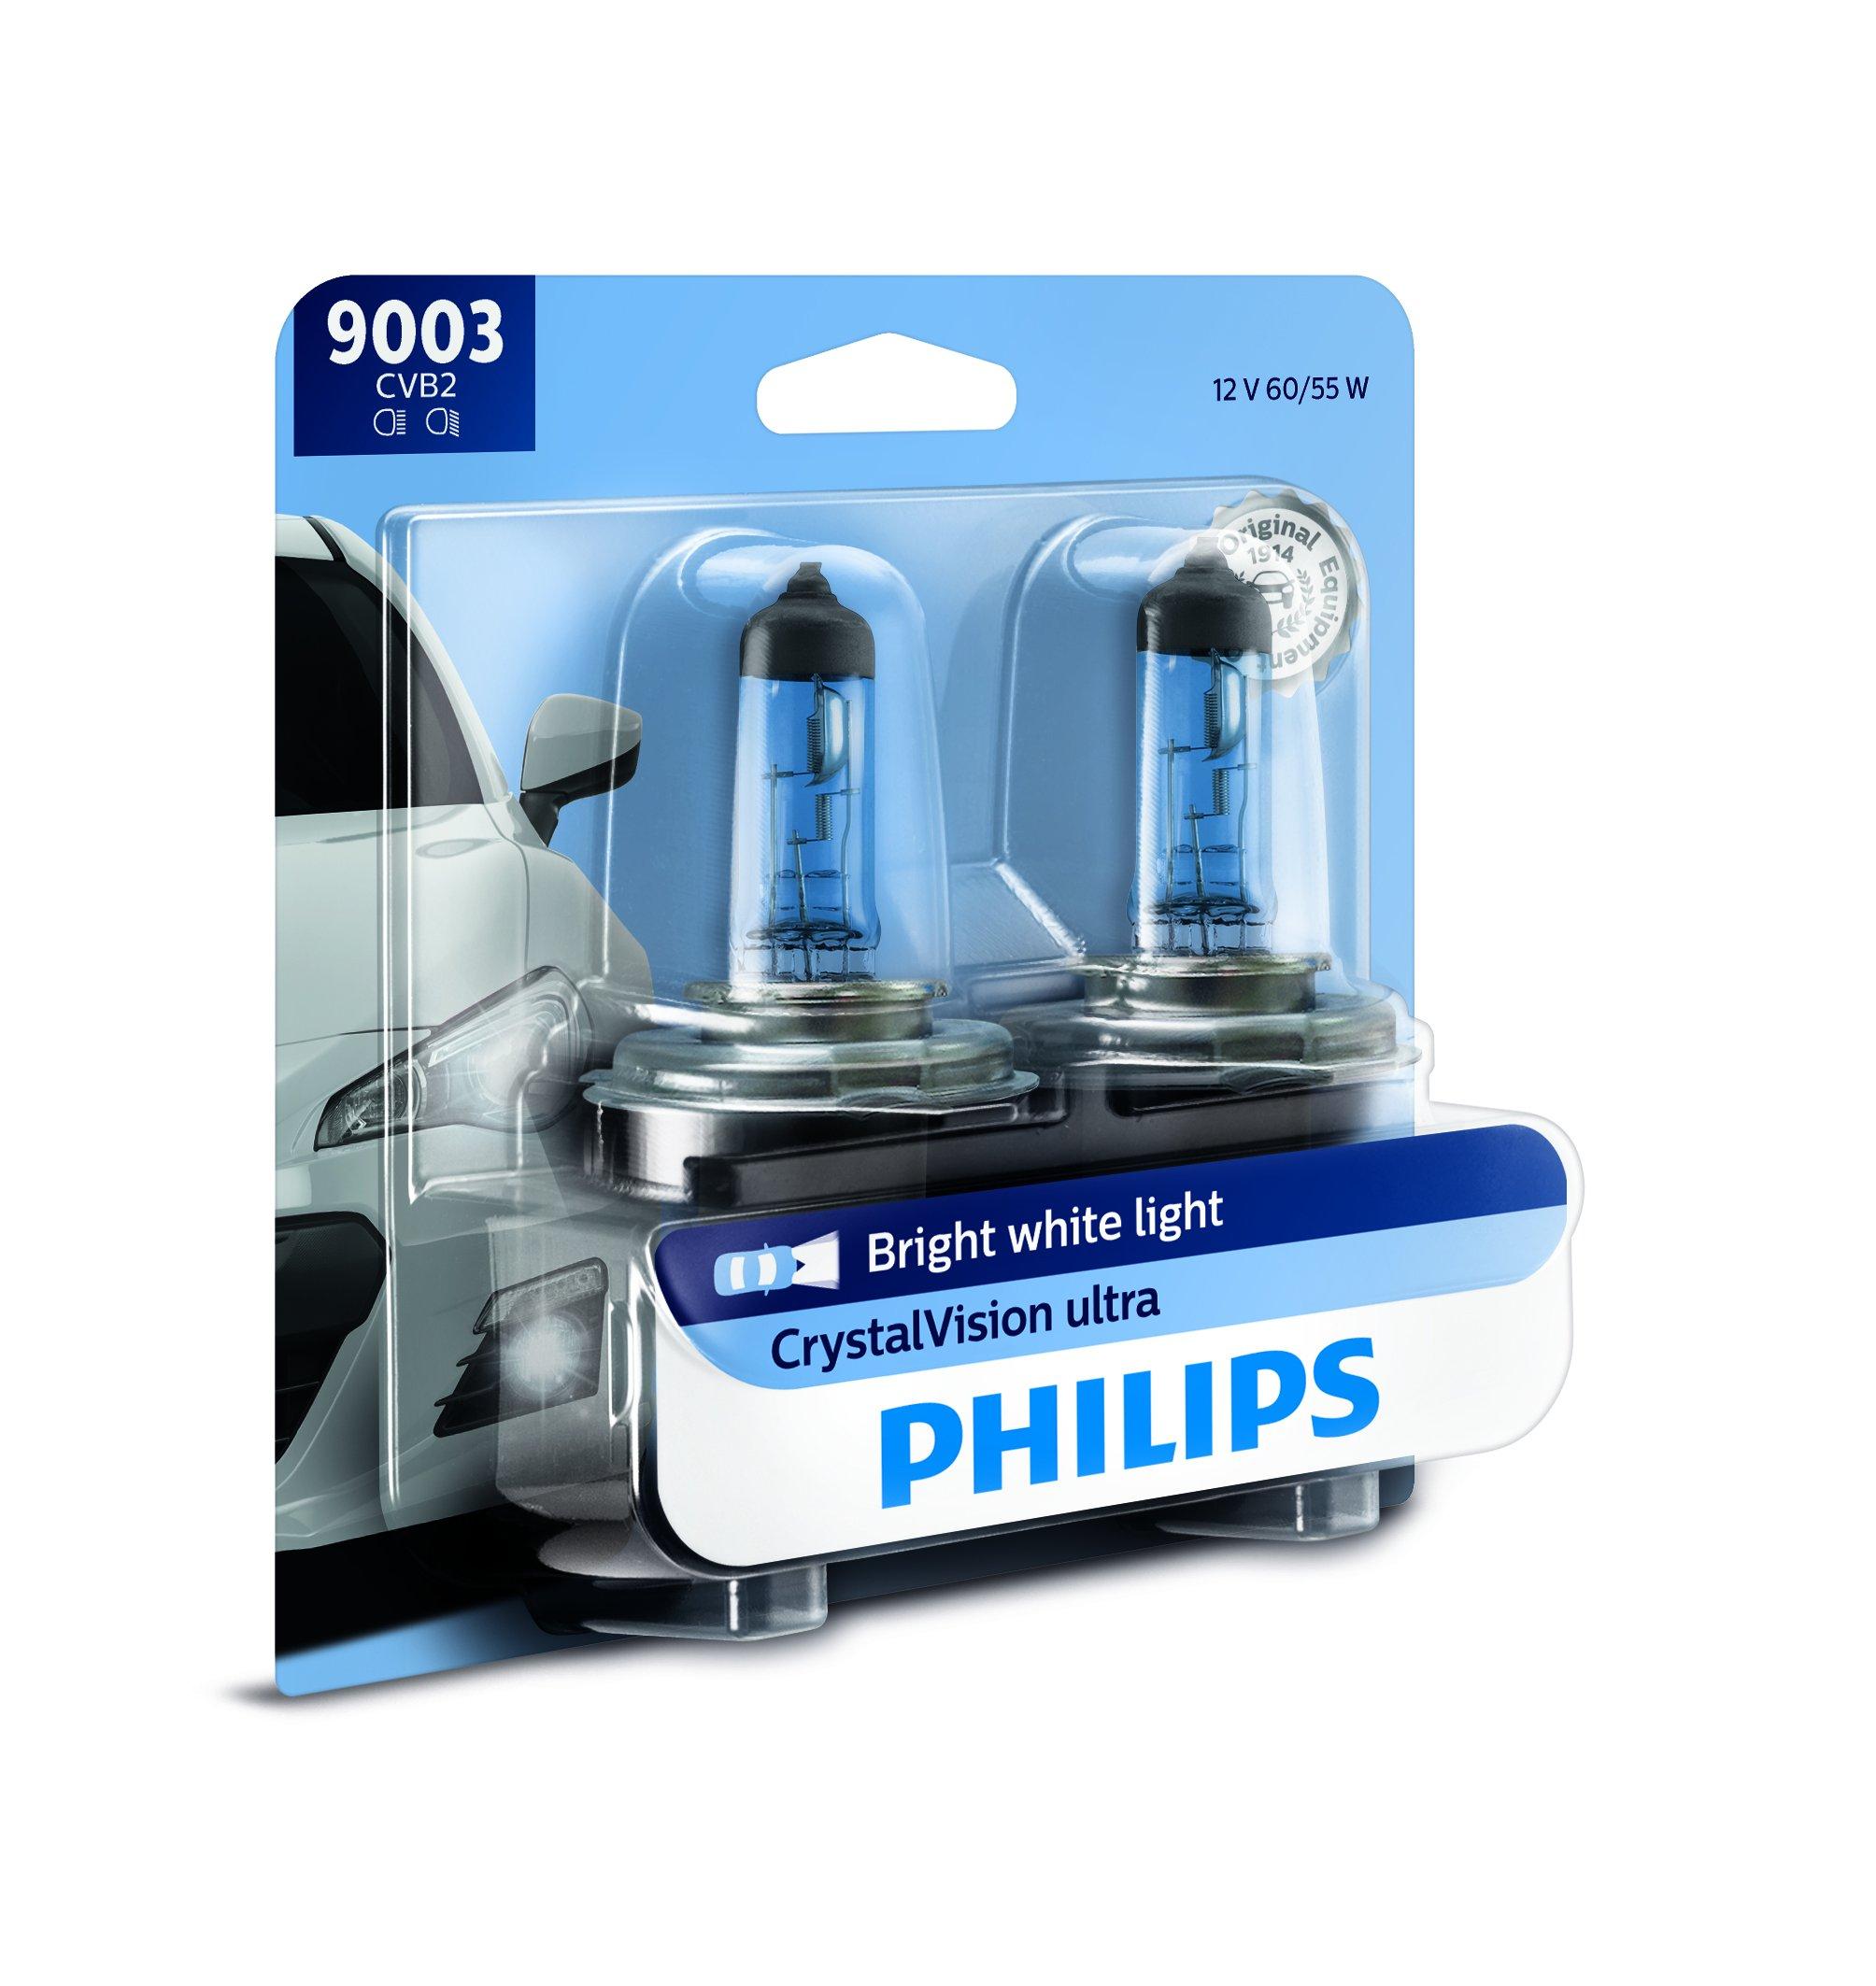 Philips 9003 CrystalVision Ultra Upgrade Bright White Headlight Bulb, 2 Pack